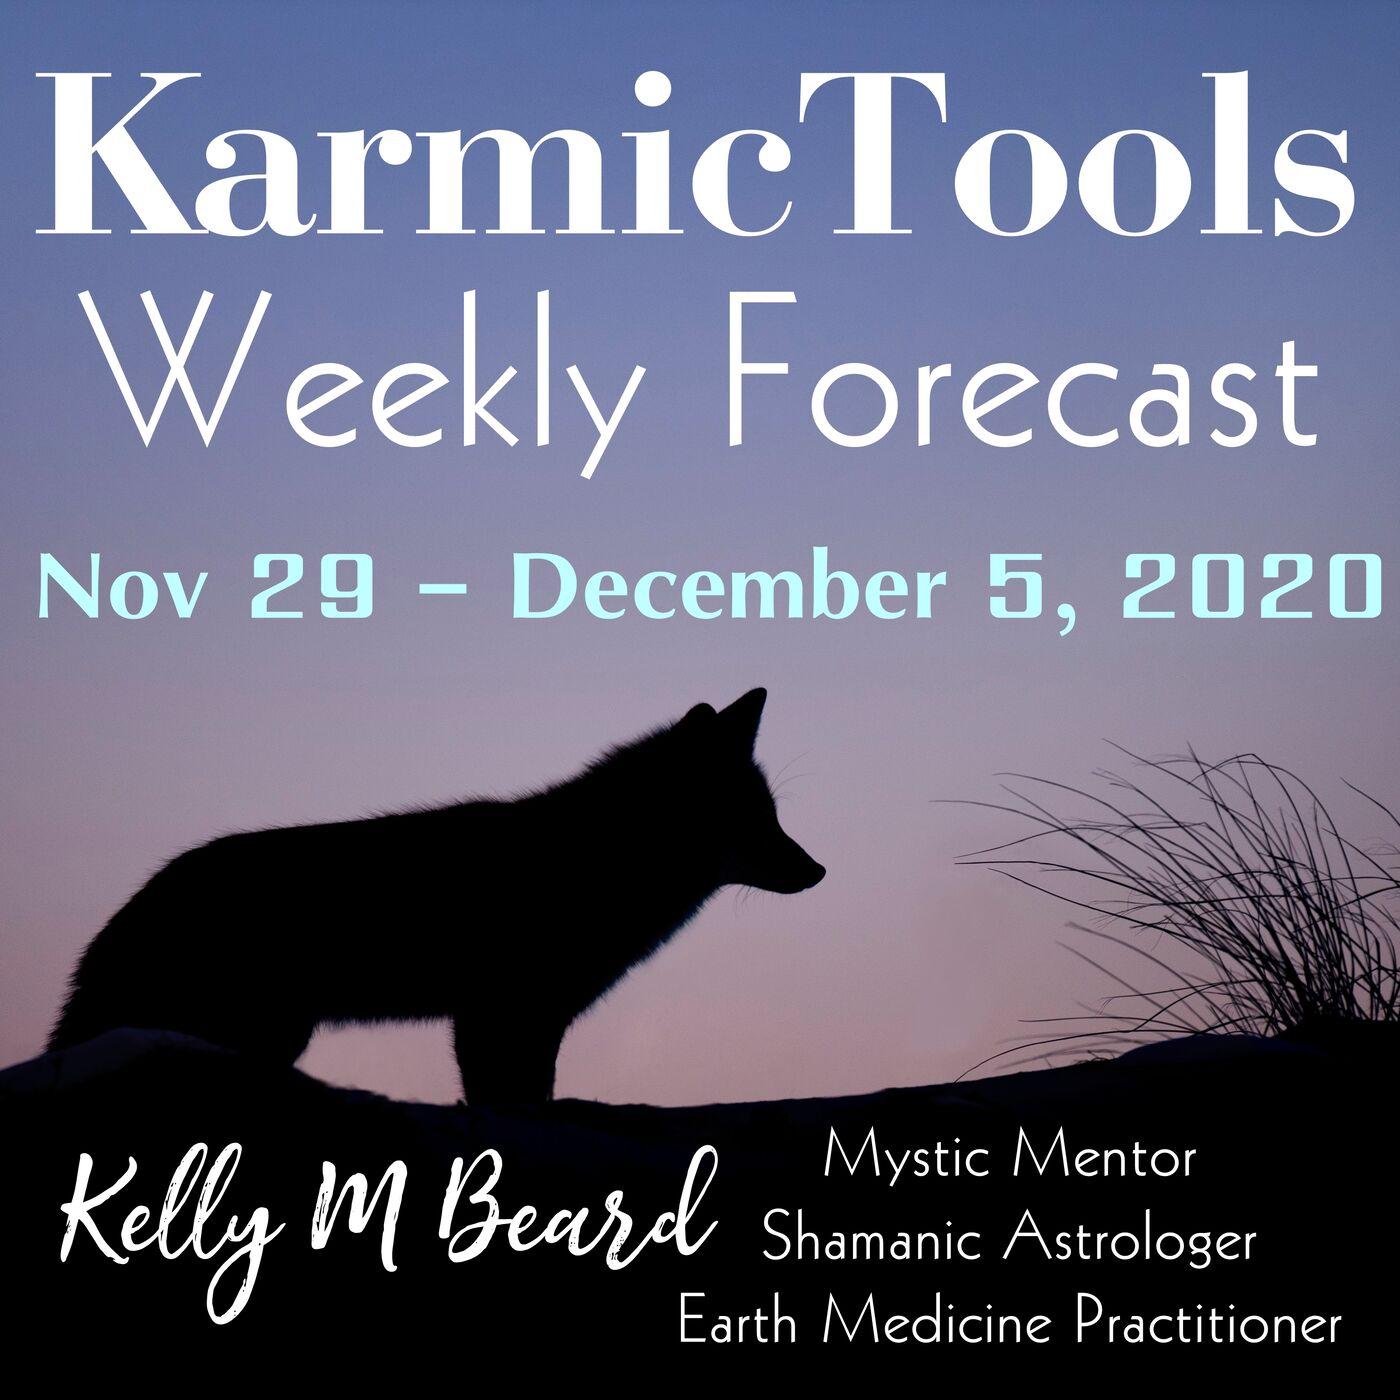 Nov 29 - Dec 5, 2020 KarmicTools Weekly Forecast